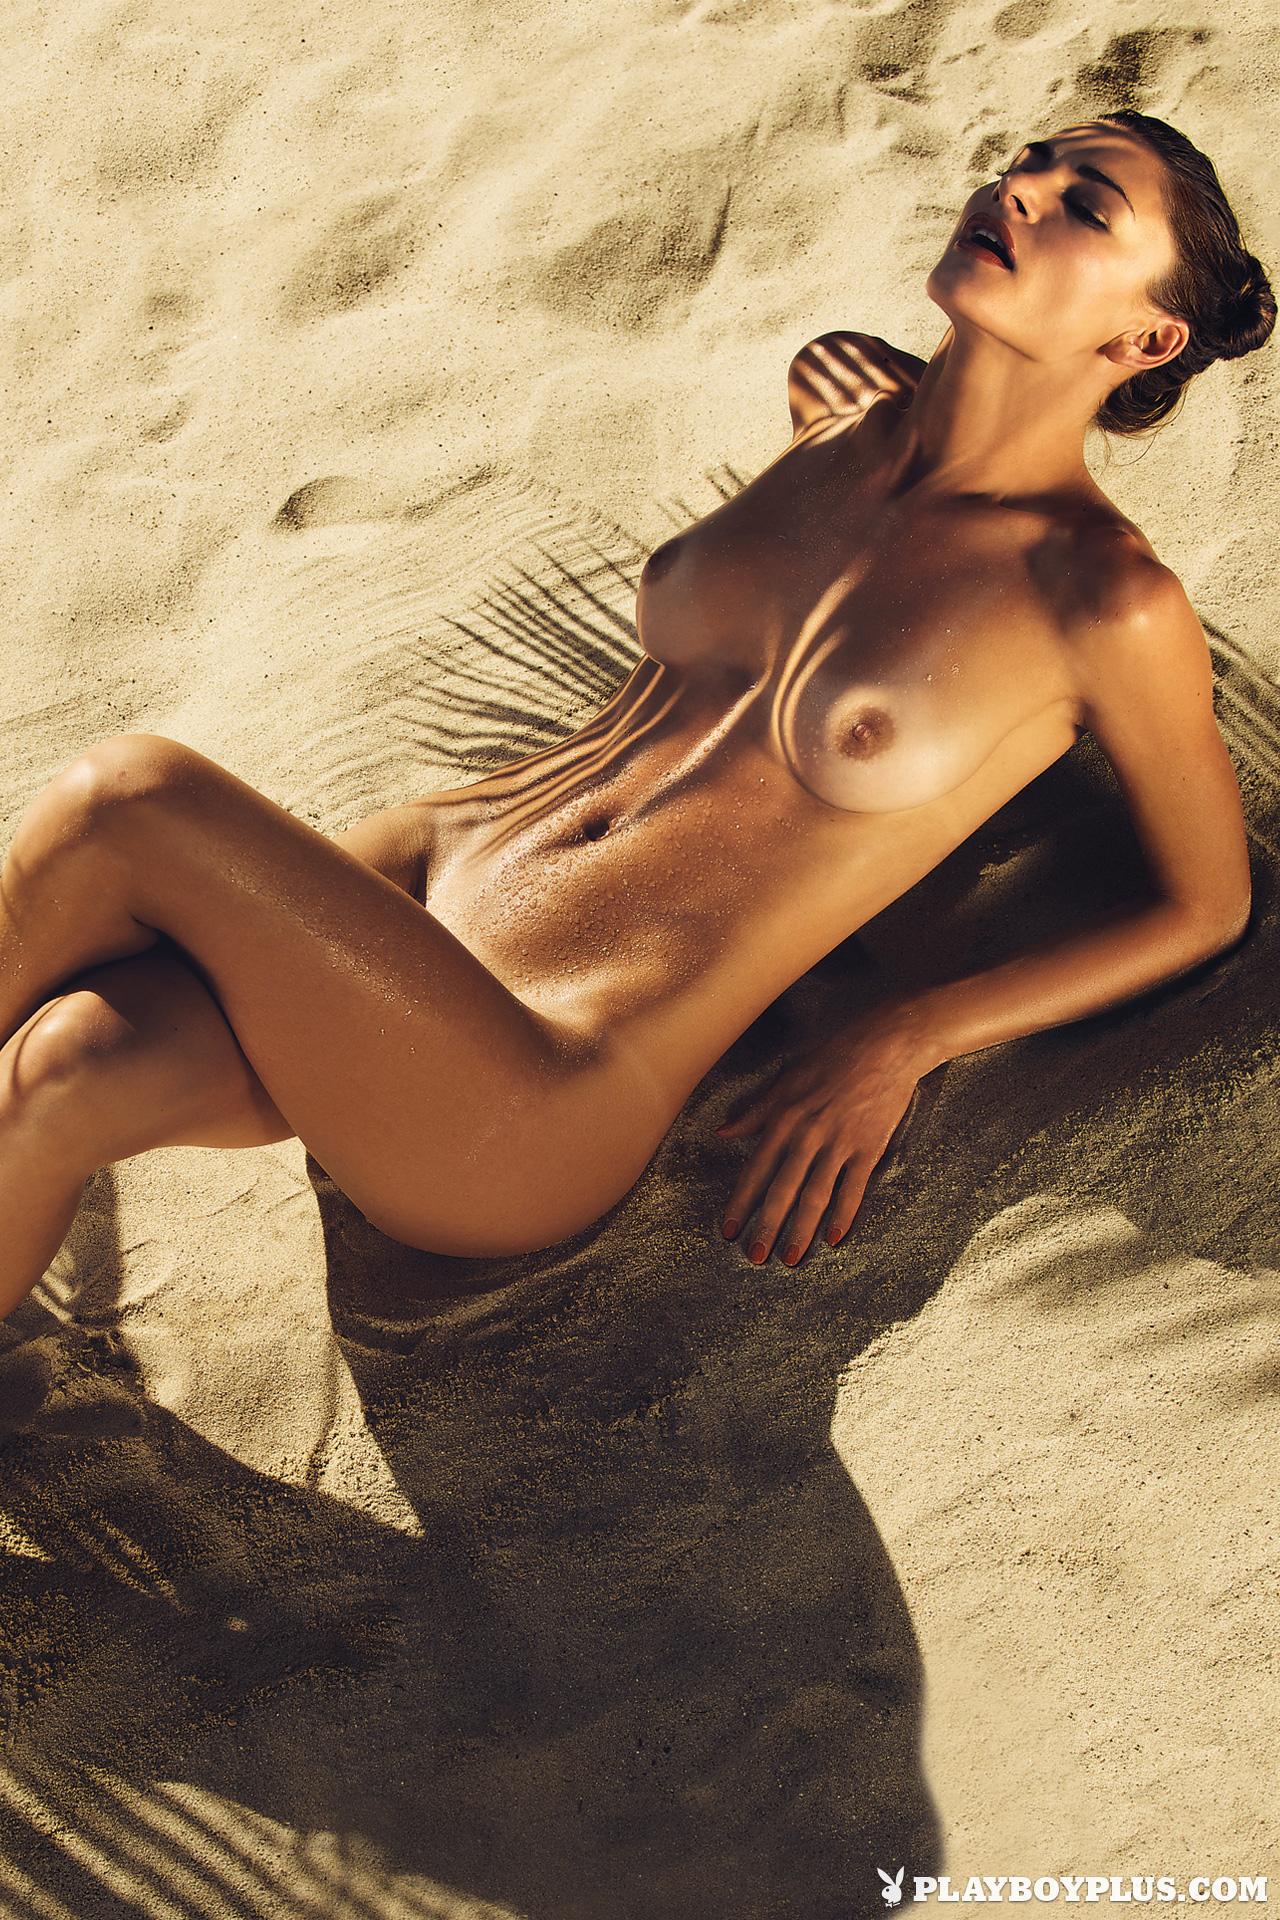 Samantha Taran in Wet Hot American Summer - Centerfolds Blog